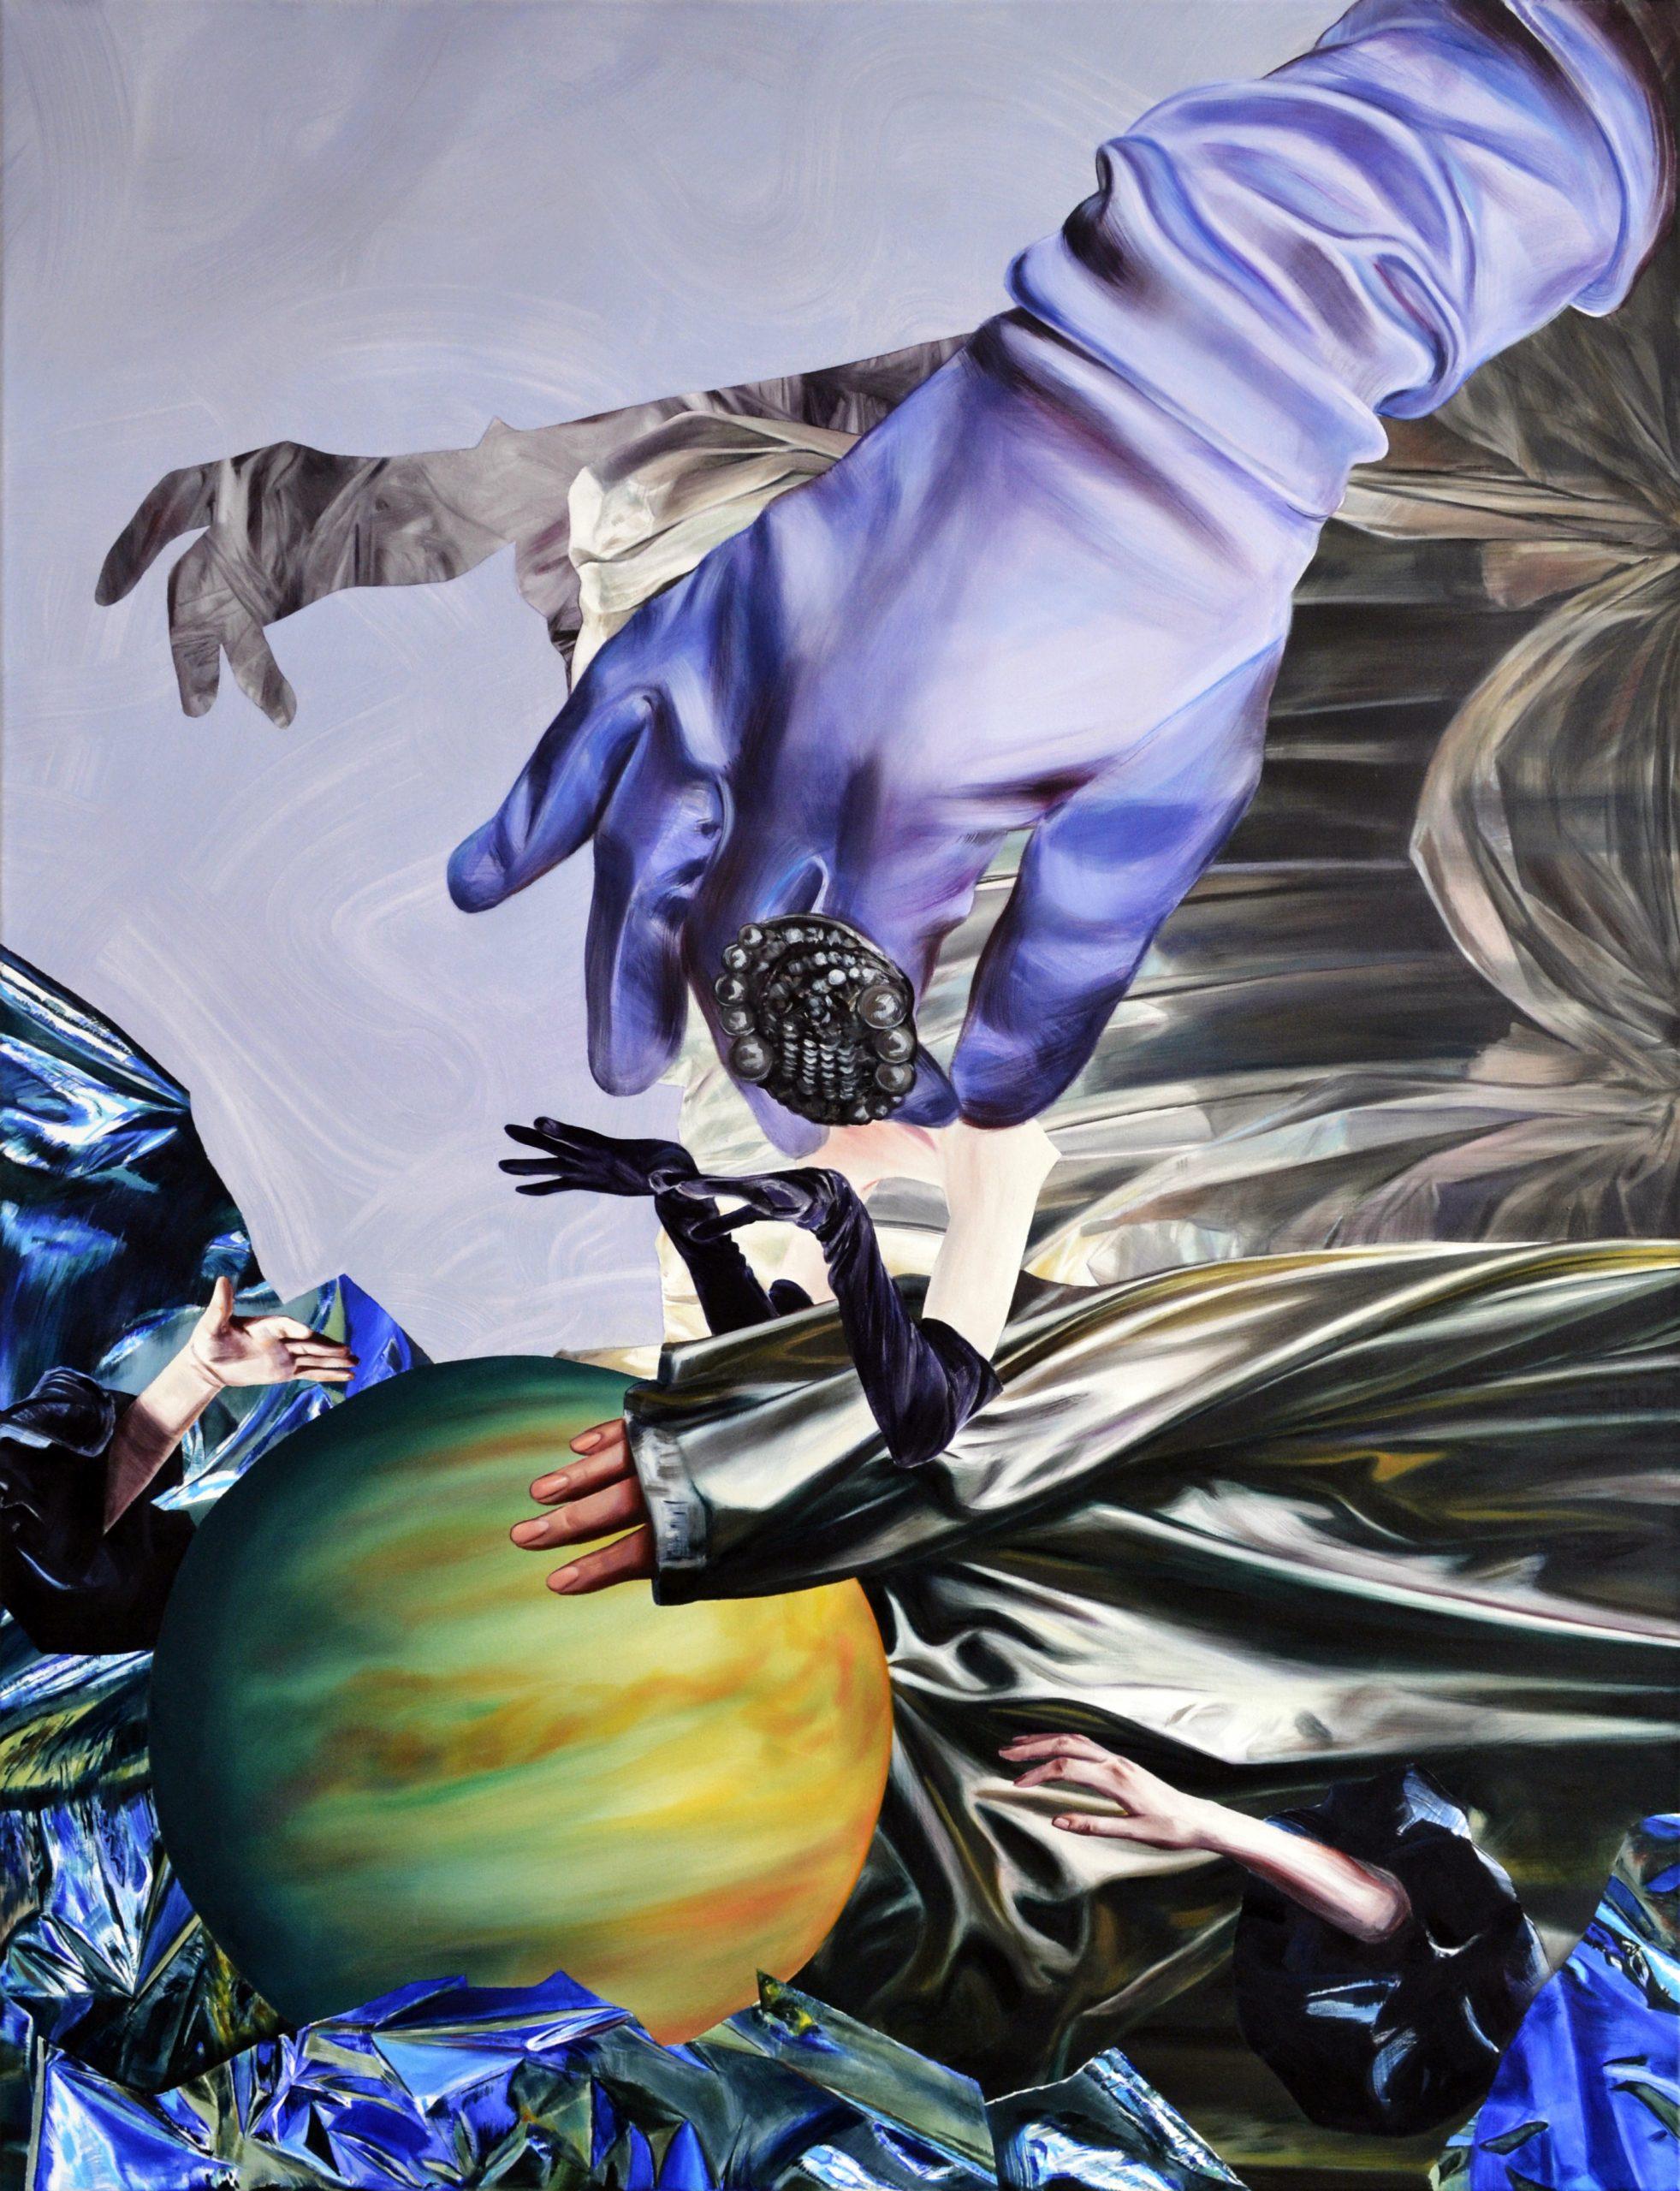 Martyna Borowiecka. She felt waves of silver glow envelop her sensitive skin. 150 x 115 cm. Oil on canvas. 2018